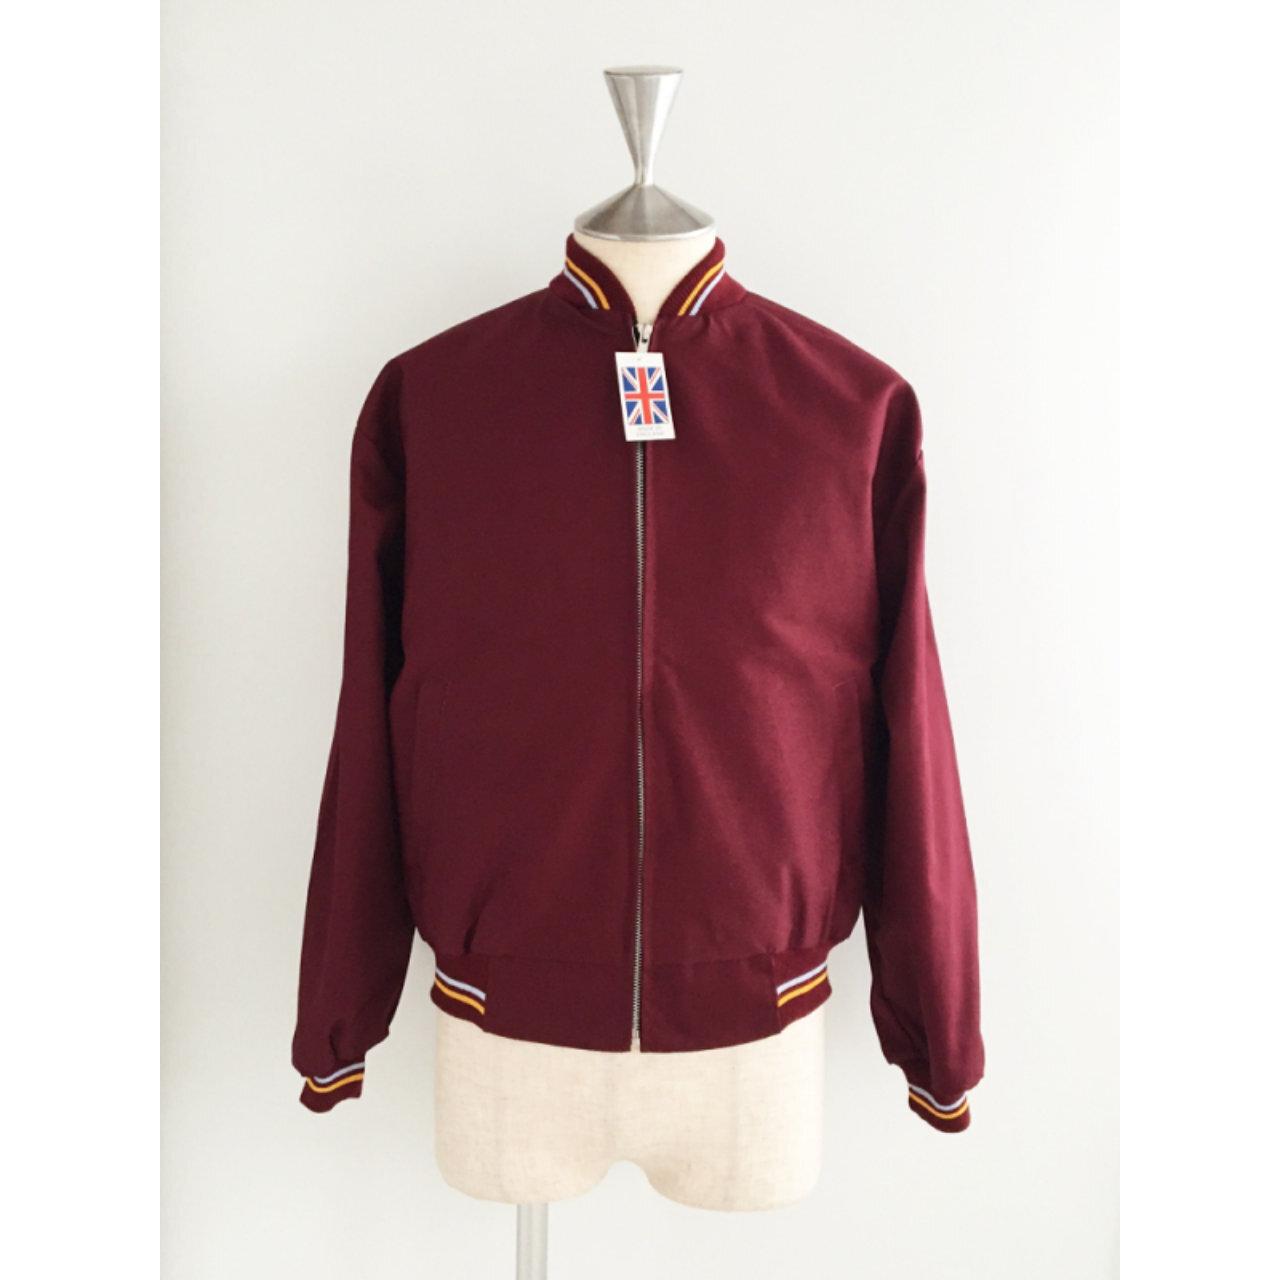 【RELCO LONDON】 英国製 モンキージャケット 〈Burgundy〉